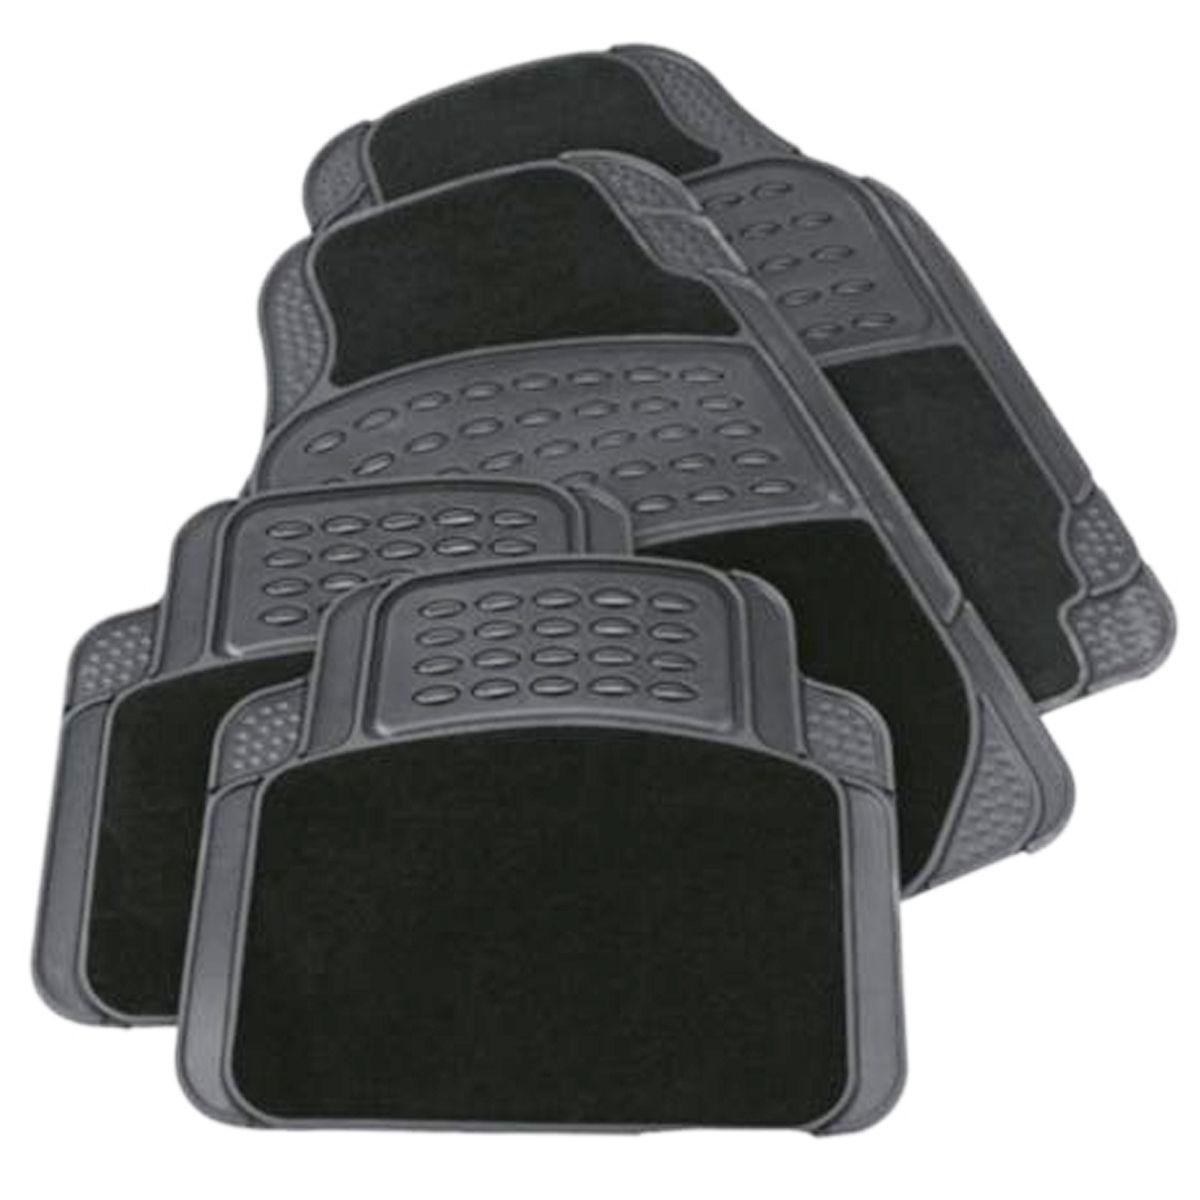 4PCS HEAVY DUTY UNIVERSAL BLACK CARPET & RUBBER CAR MAT SET NON SLIP VAN MATS